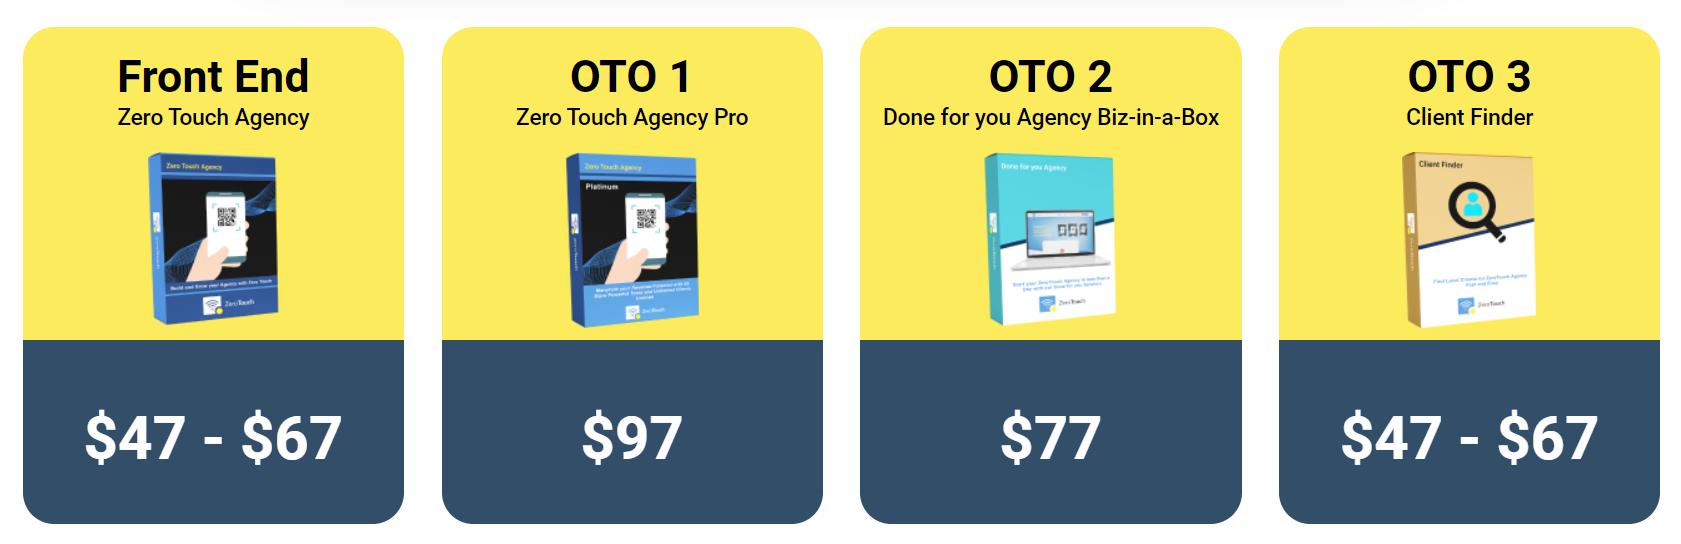 zerotouch agency otos